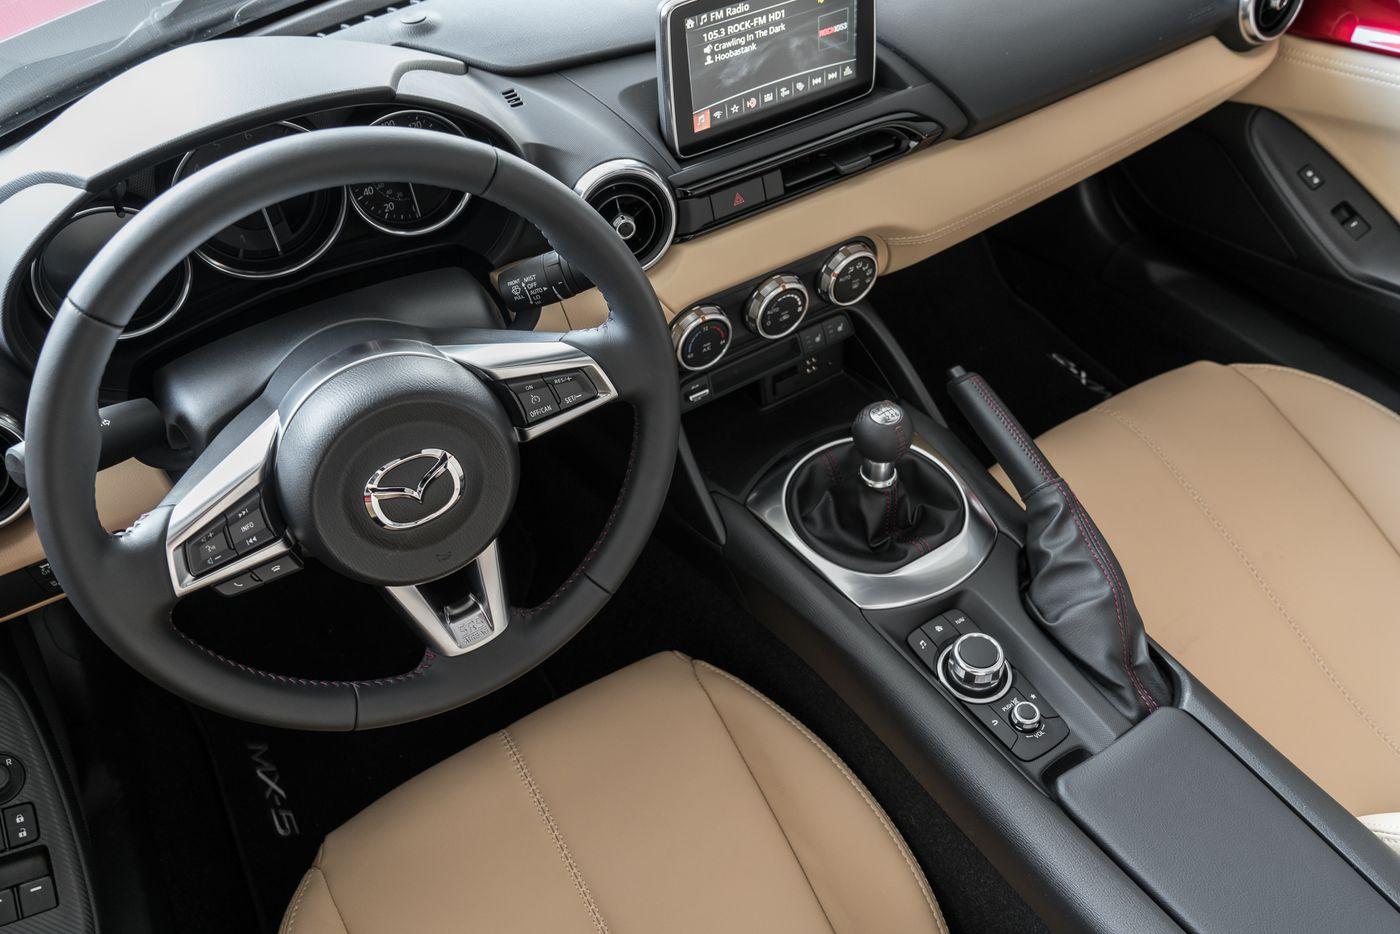 2017 Mazda Mx 5 Miata Rf Grand Touring >> 2017 Mazda Mx 5 Rf Out Miatas The Miata